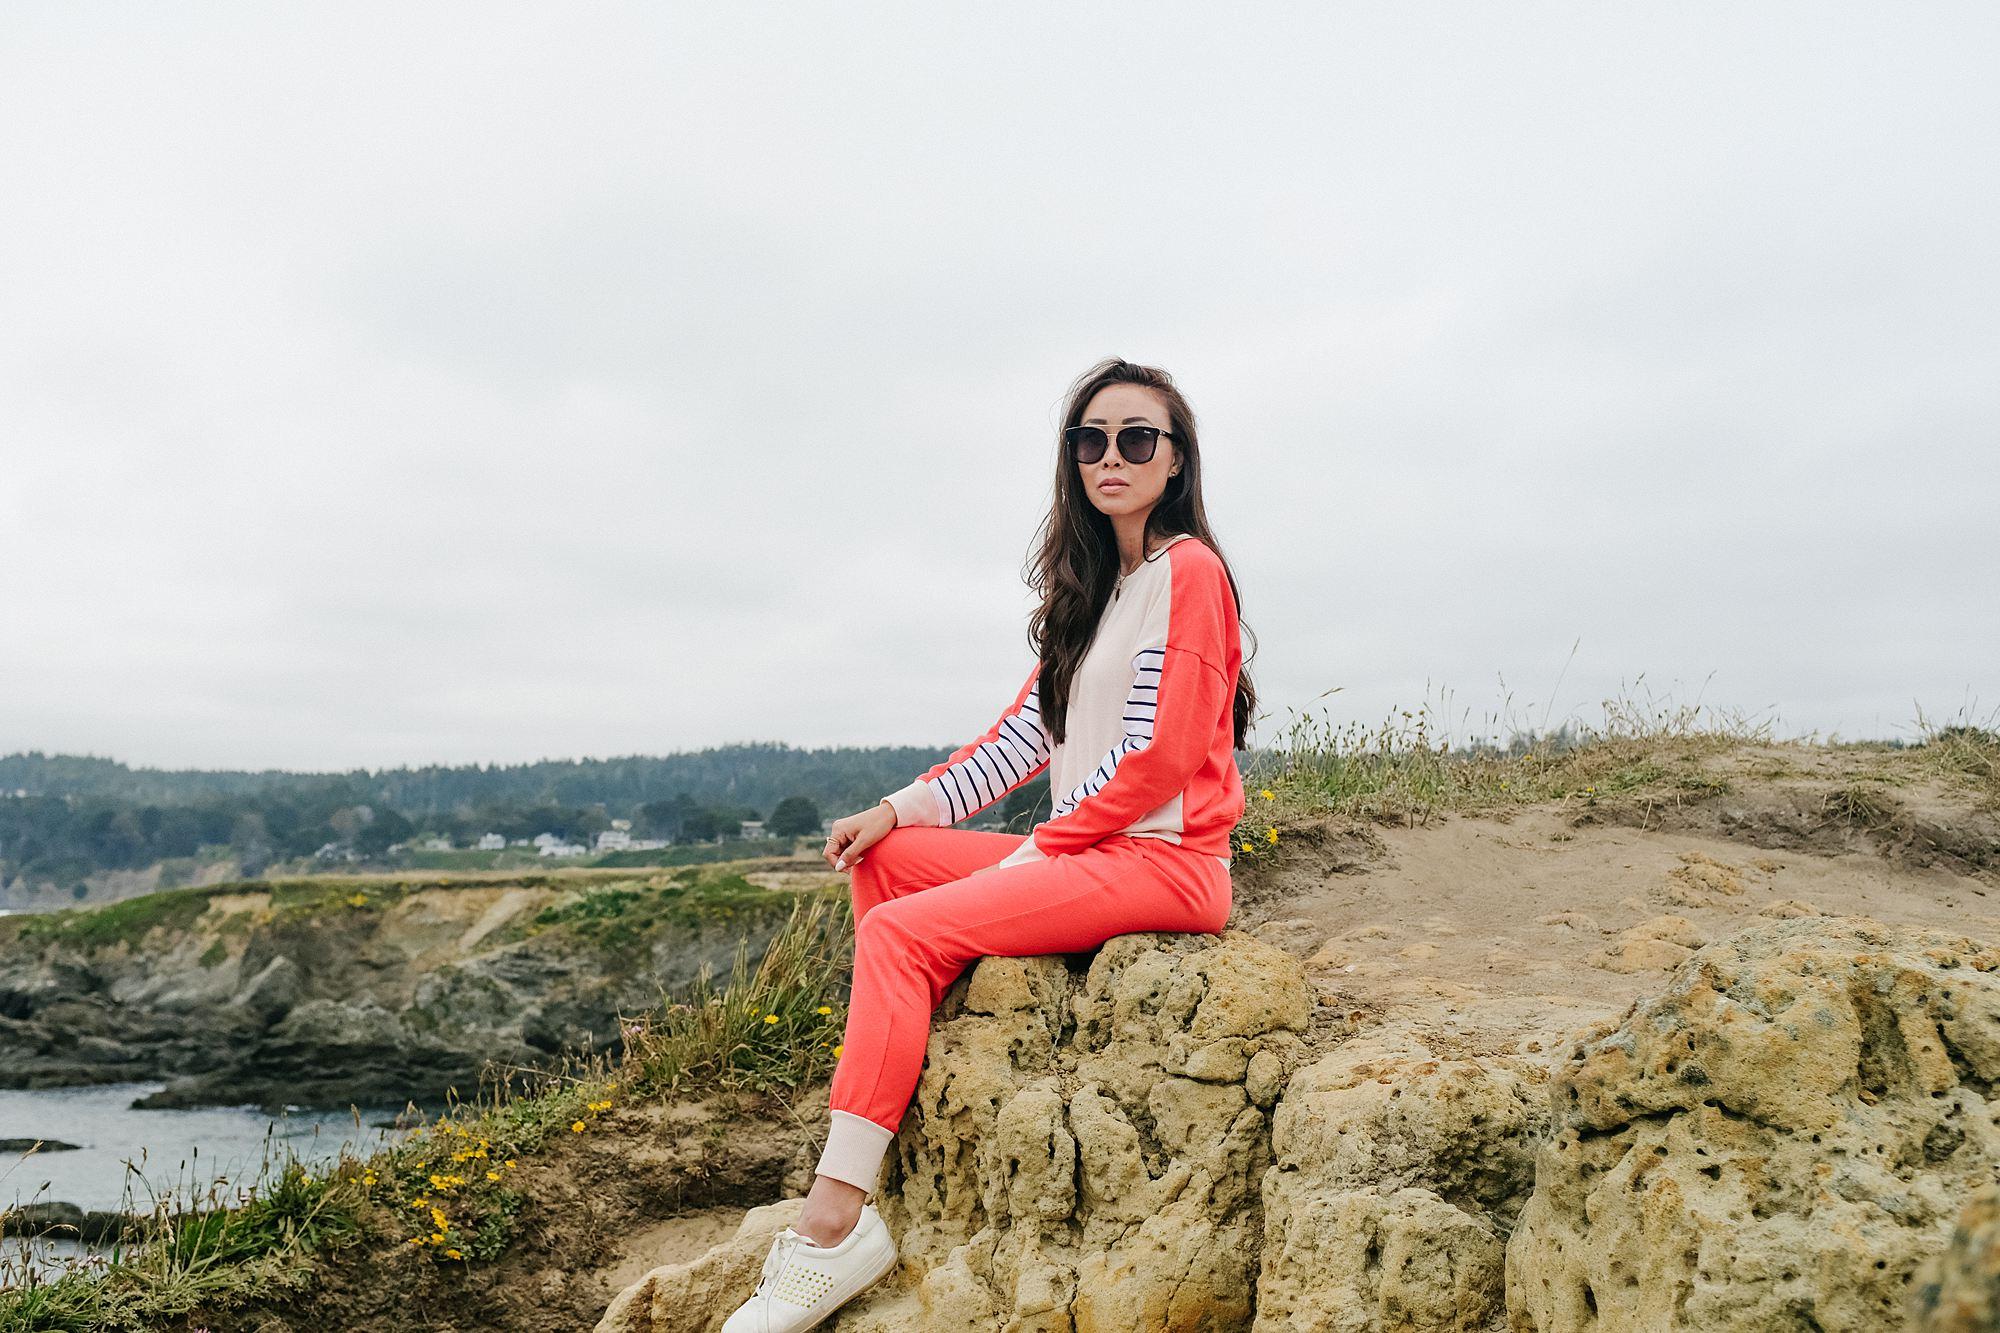 Mendocino County lookout points coastal views